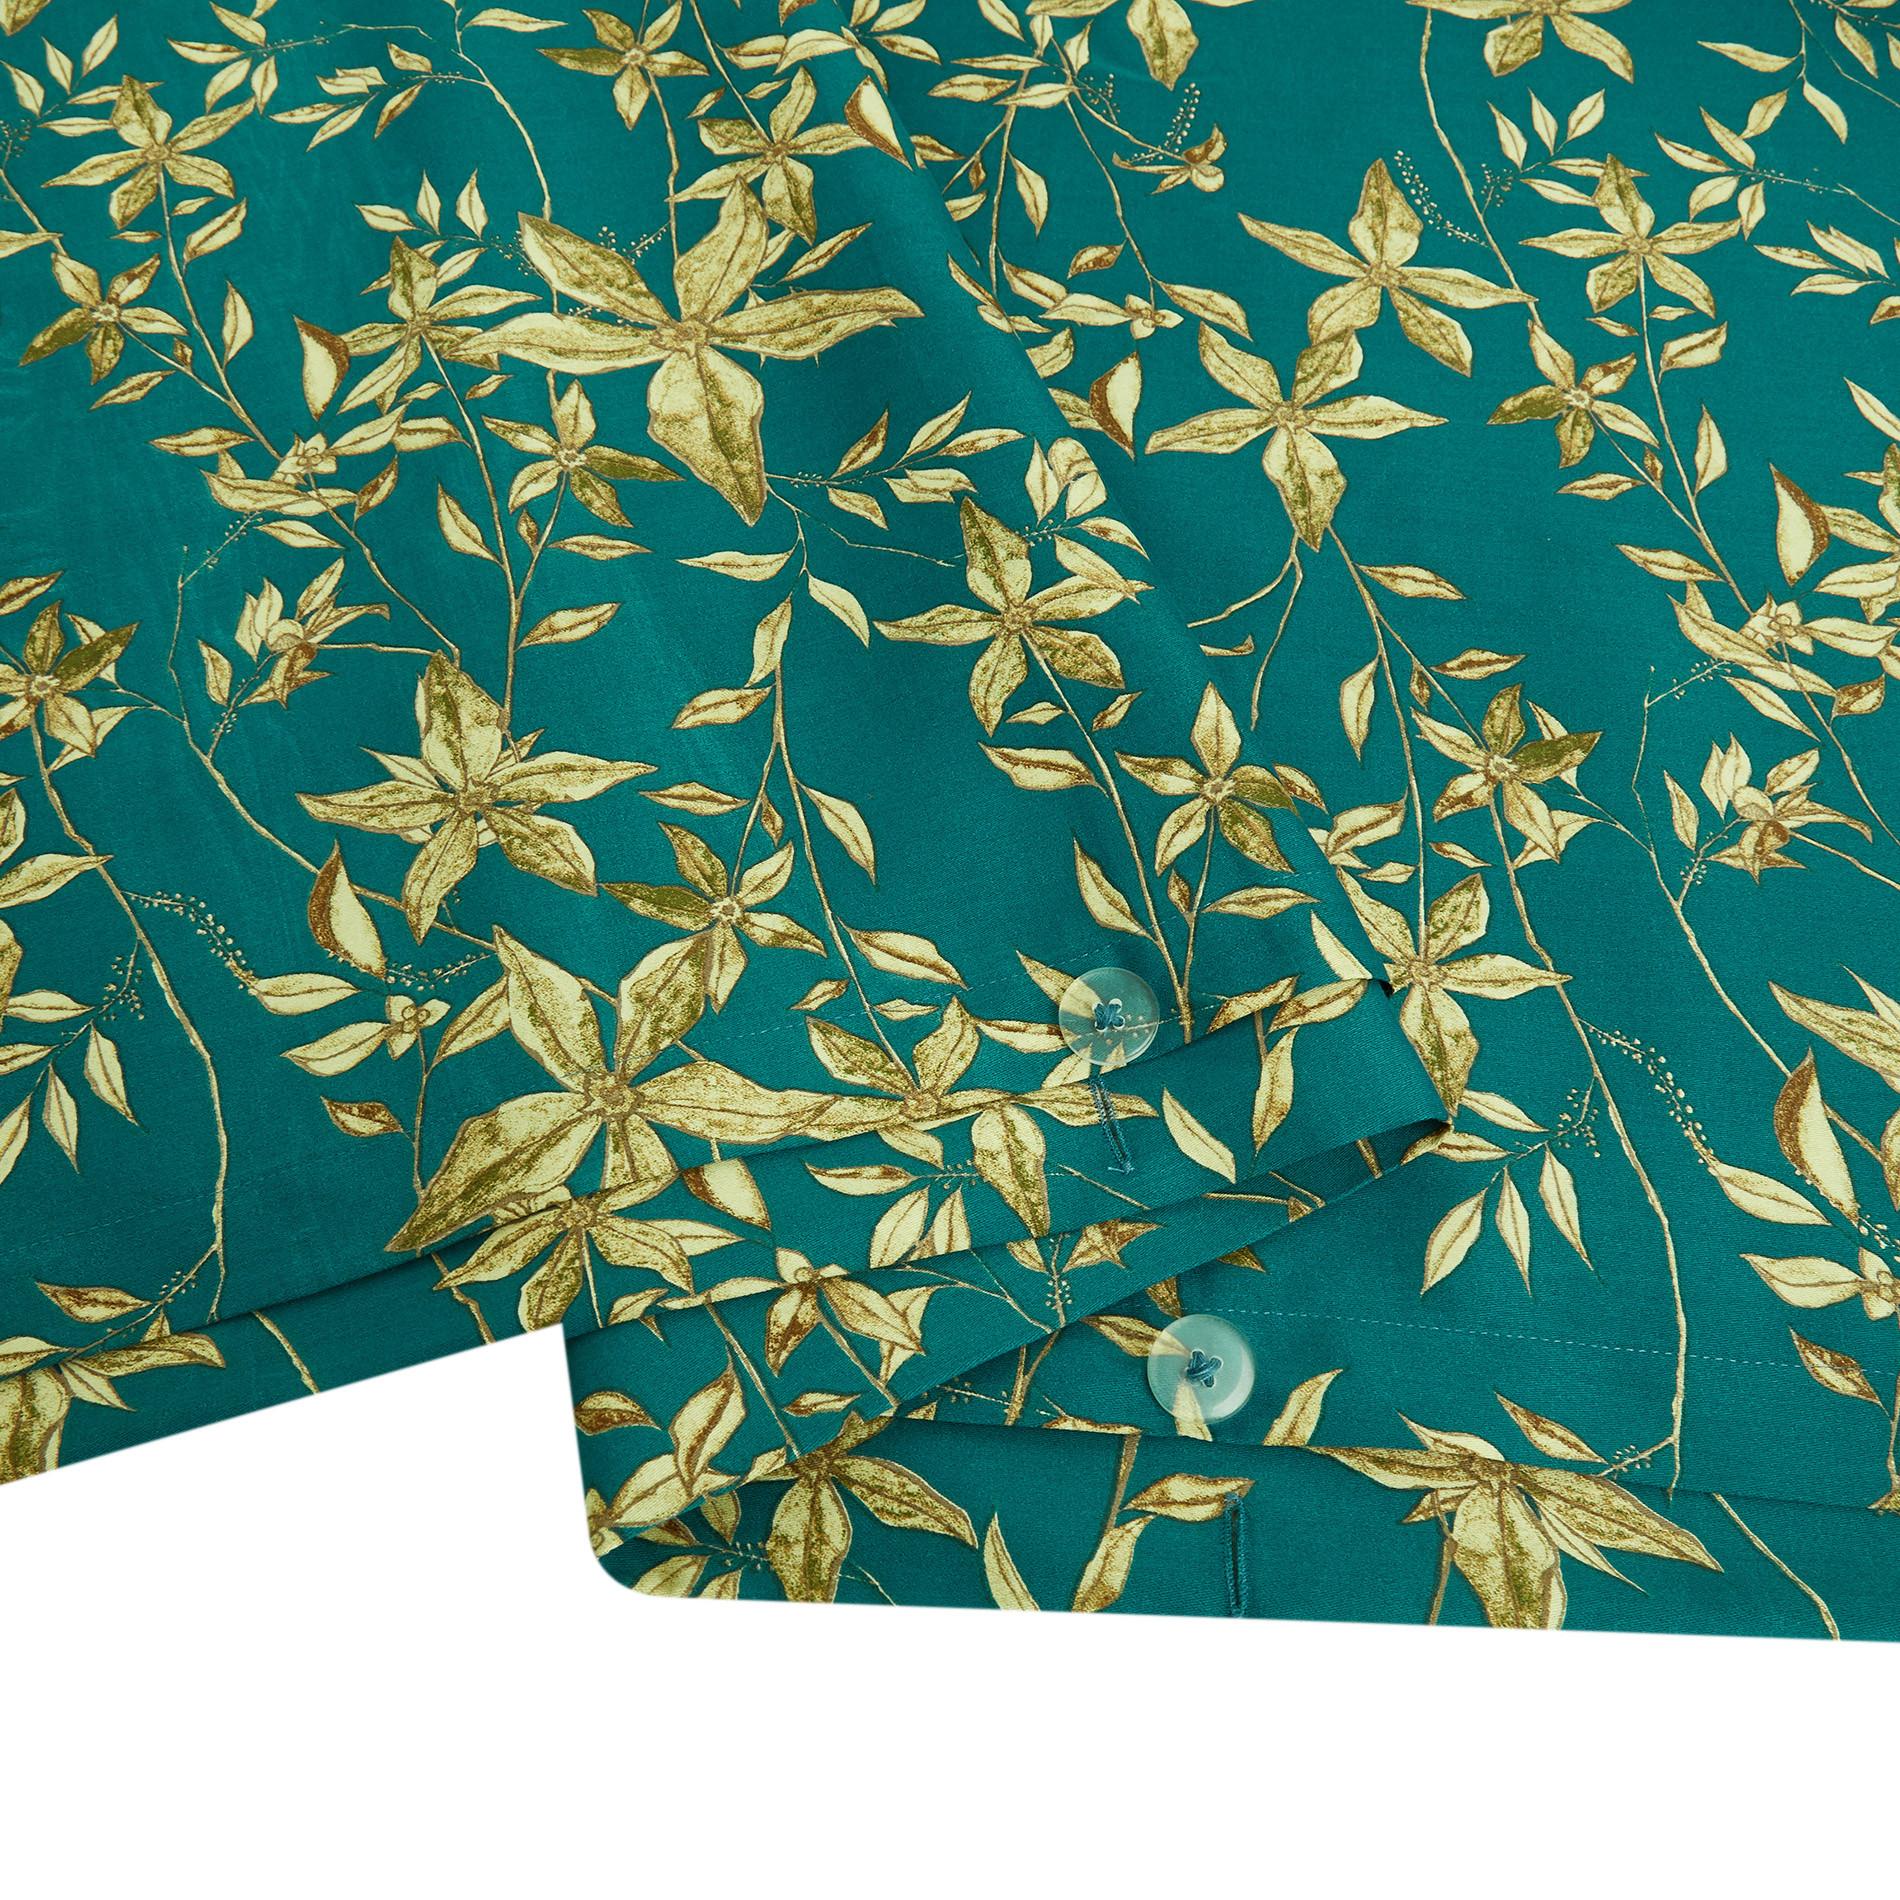 Copripiumino raso di cotone fantasia a fiori, Petrolio, large image number 3